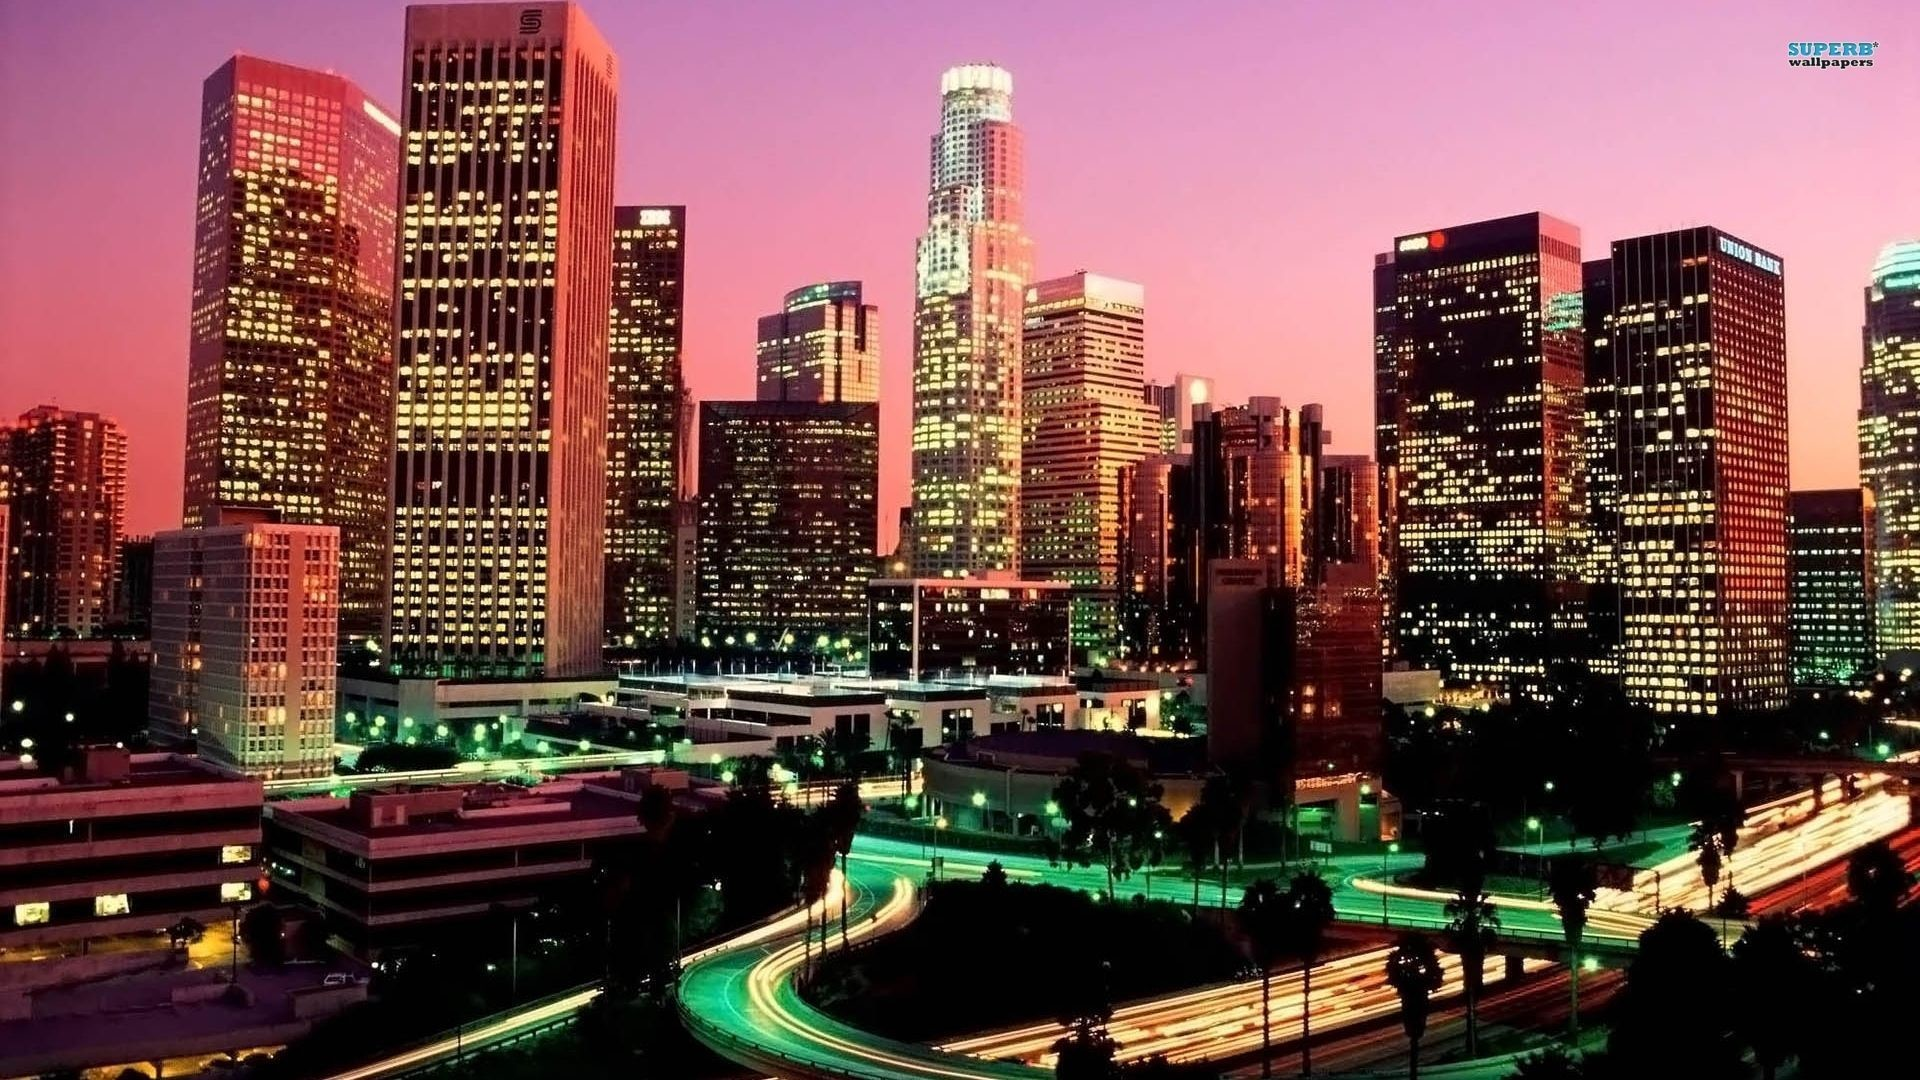 Los Angeles wallpaper – World wallpapers – #4161